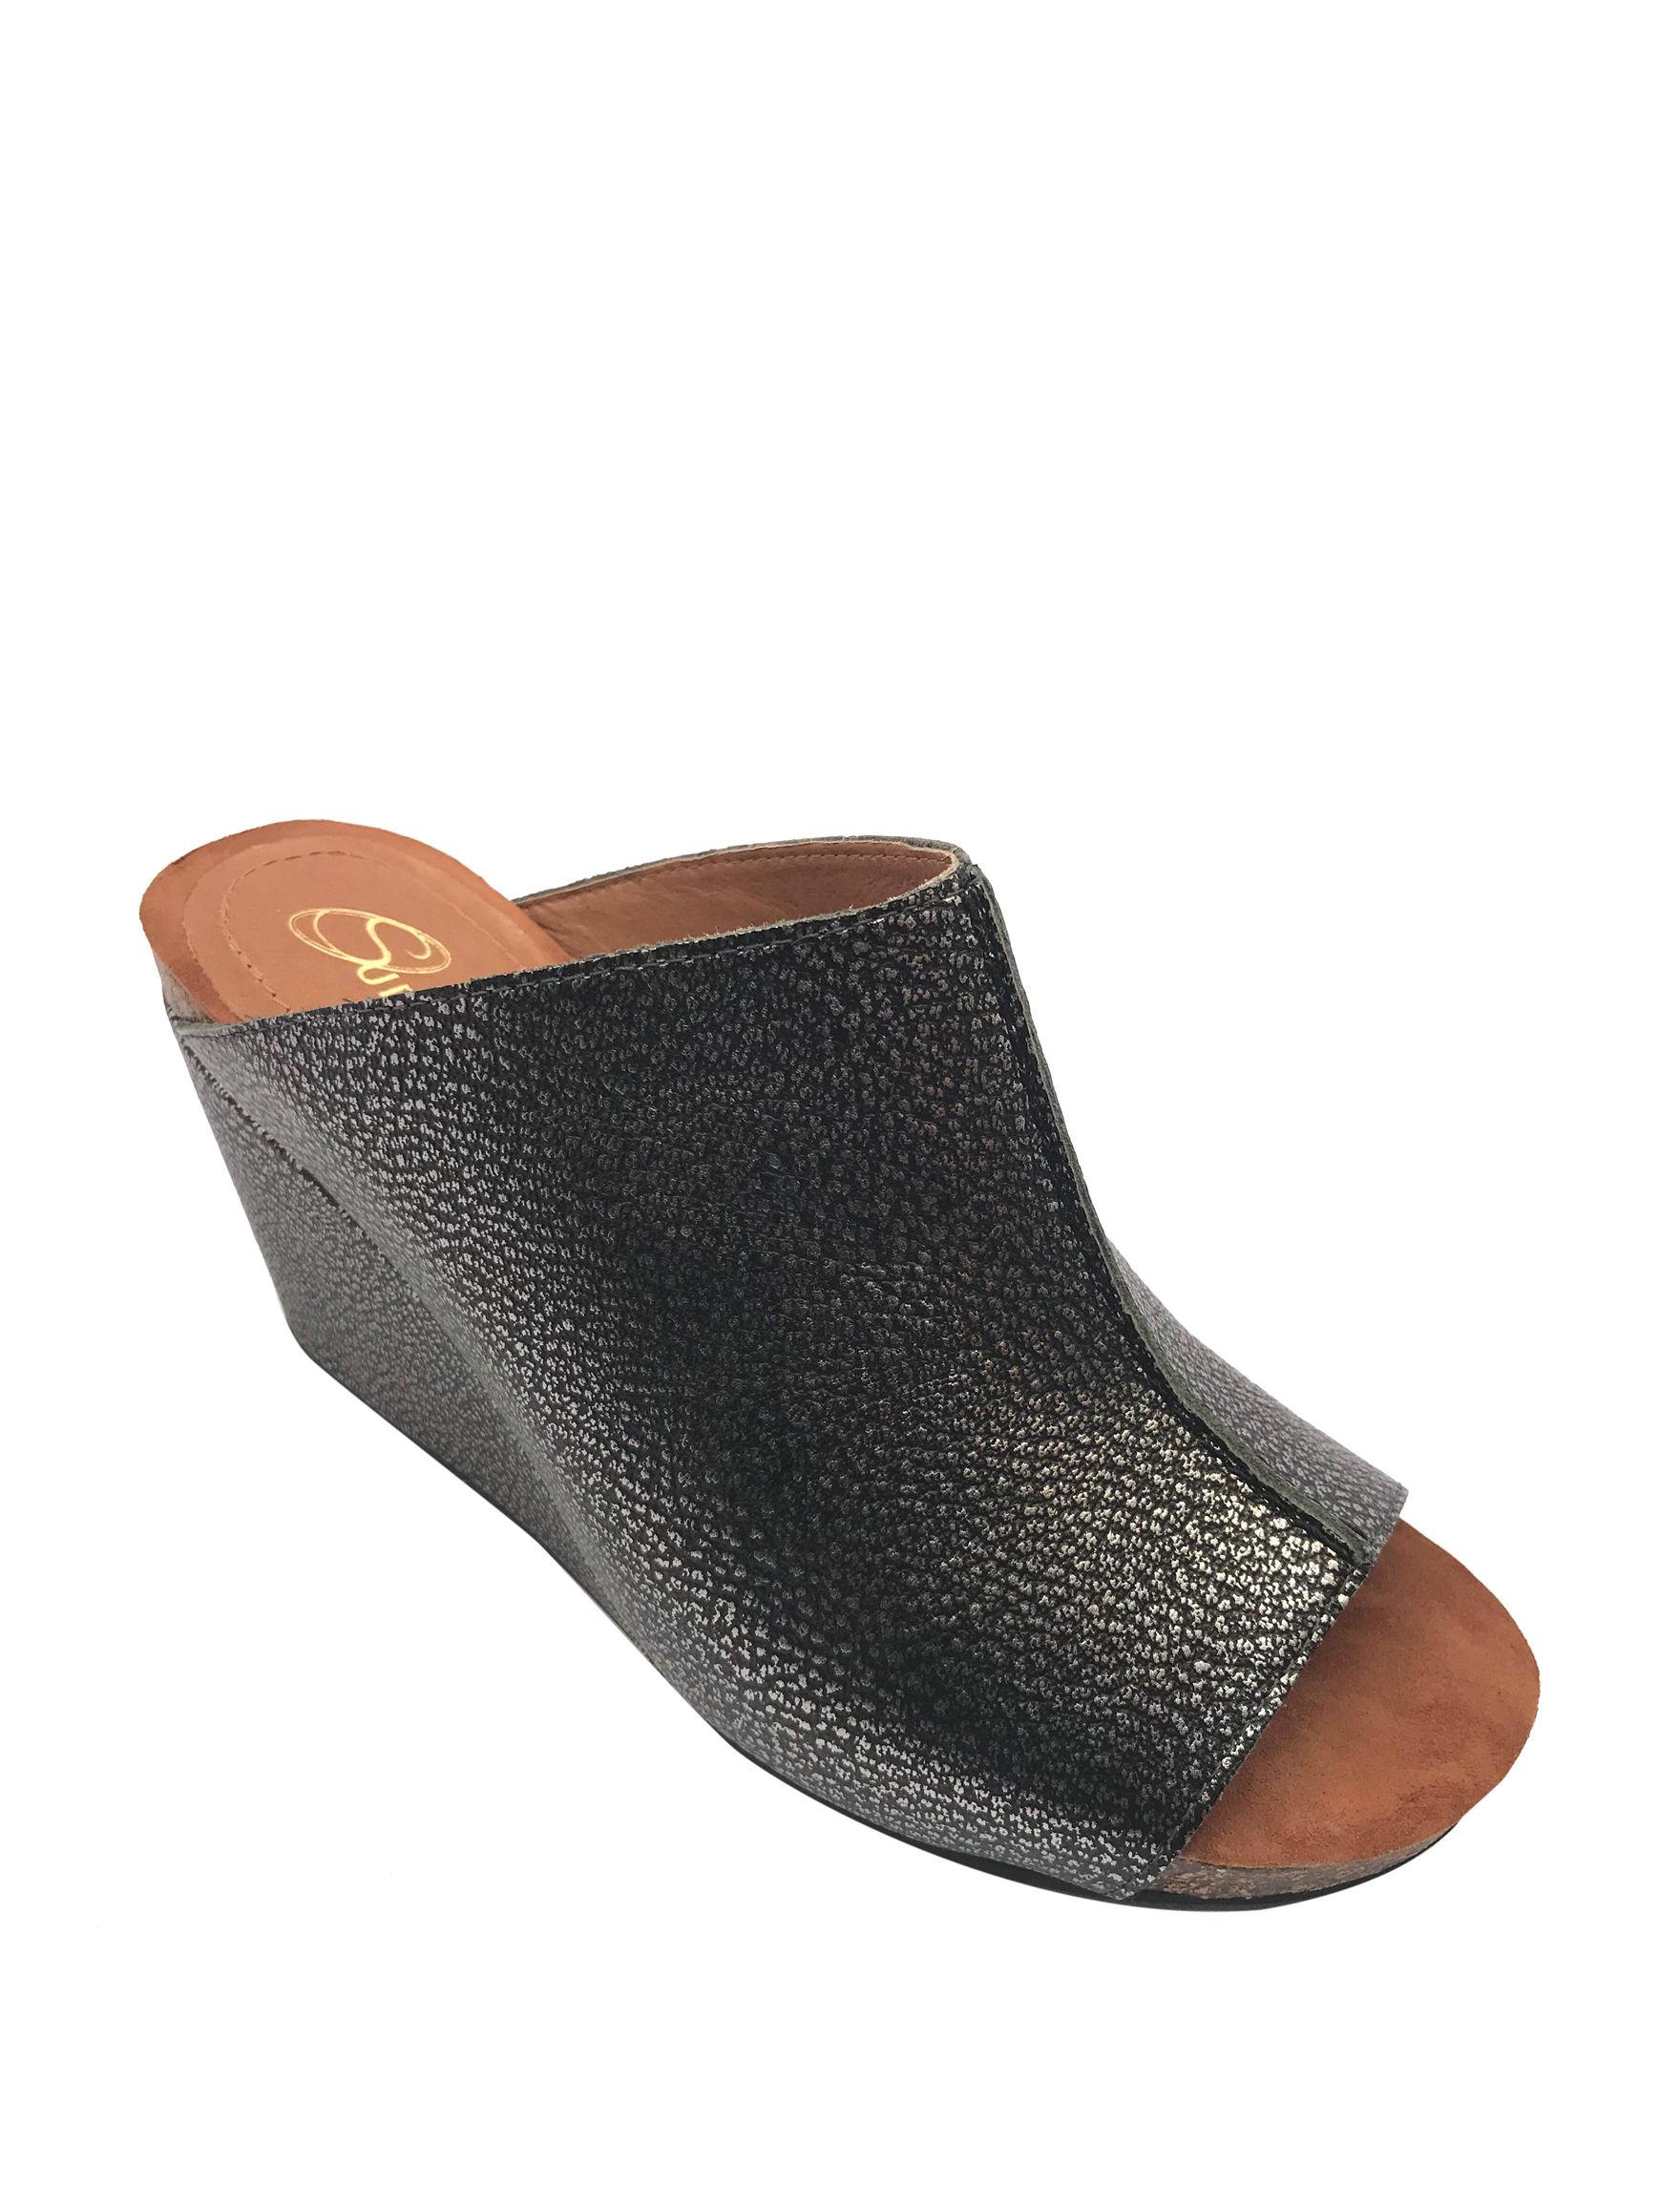 Sudini Pewter Wedge Sandals